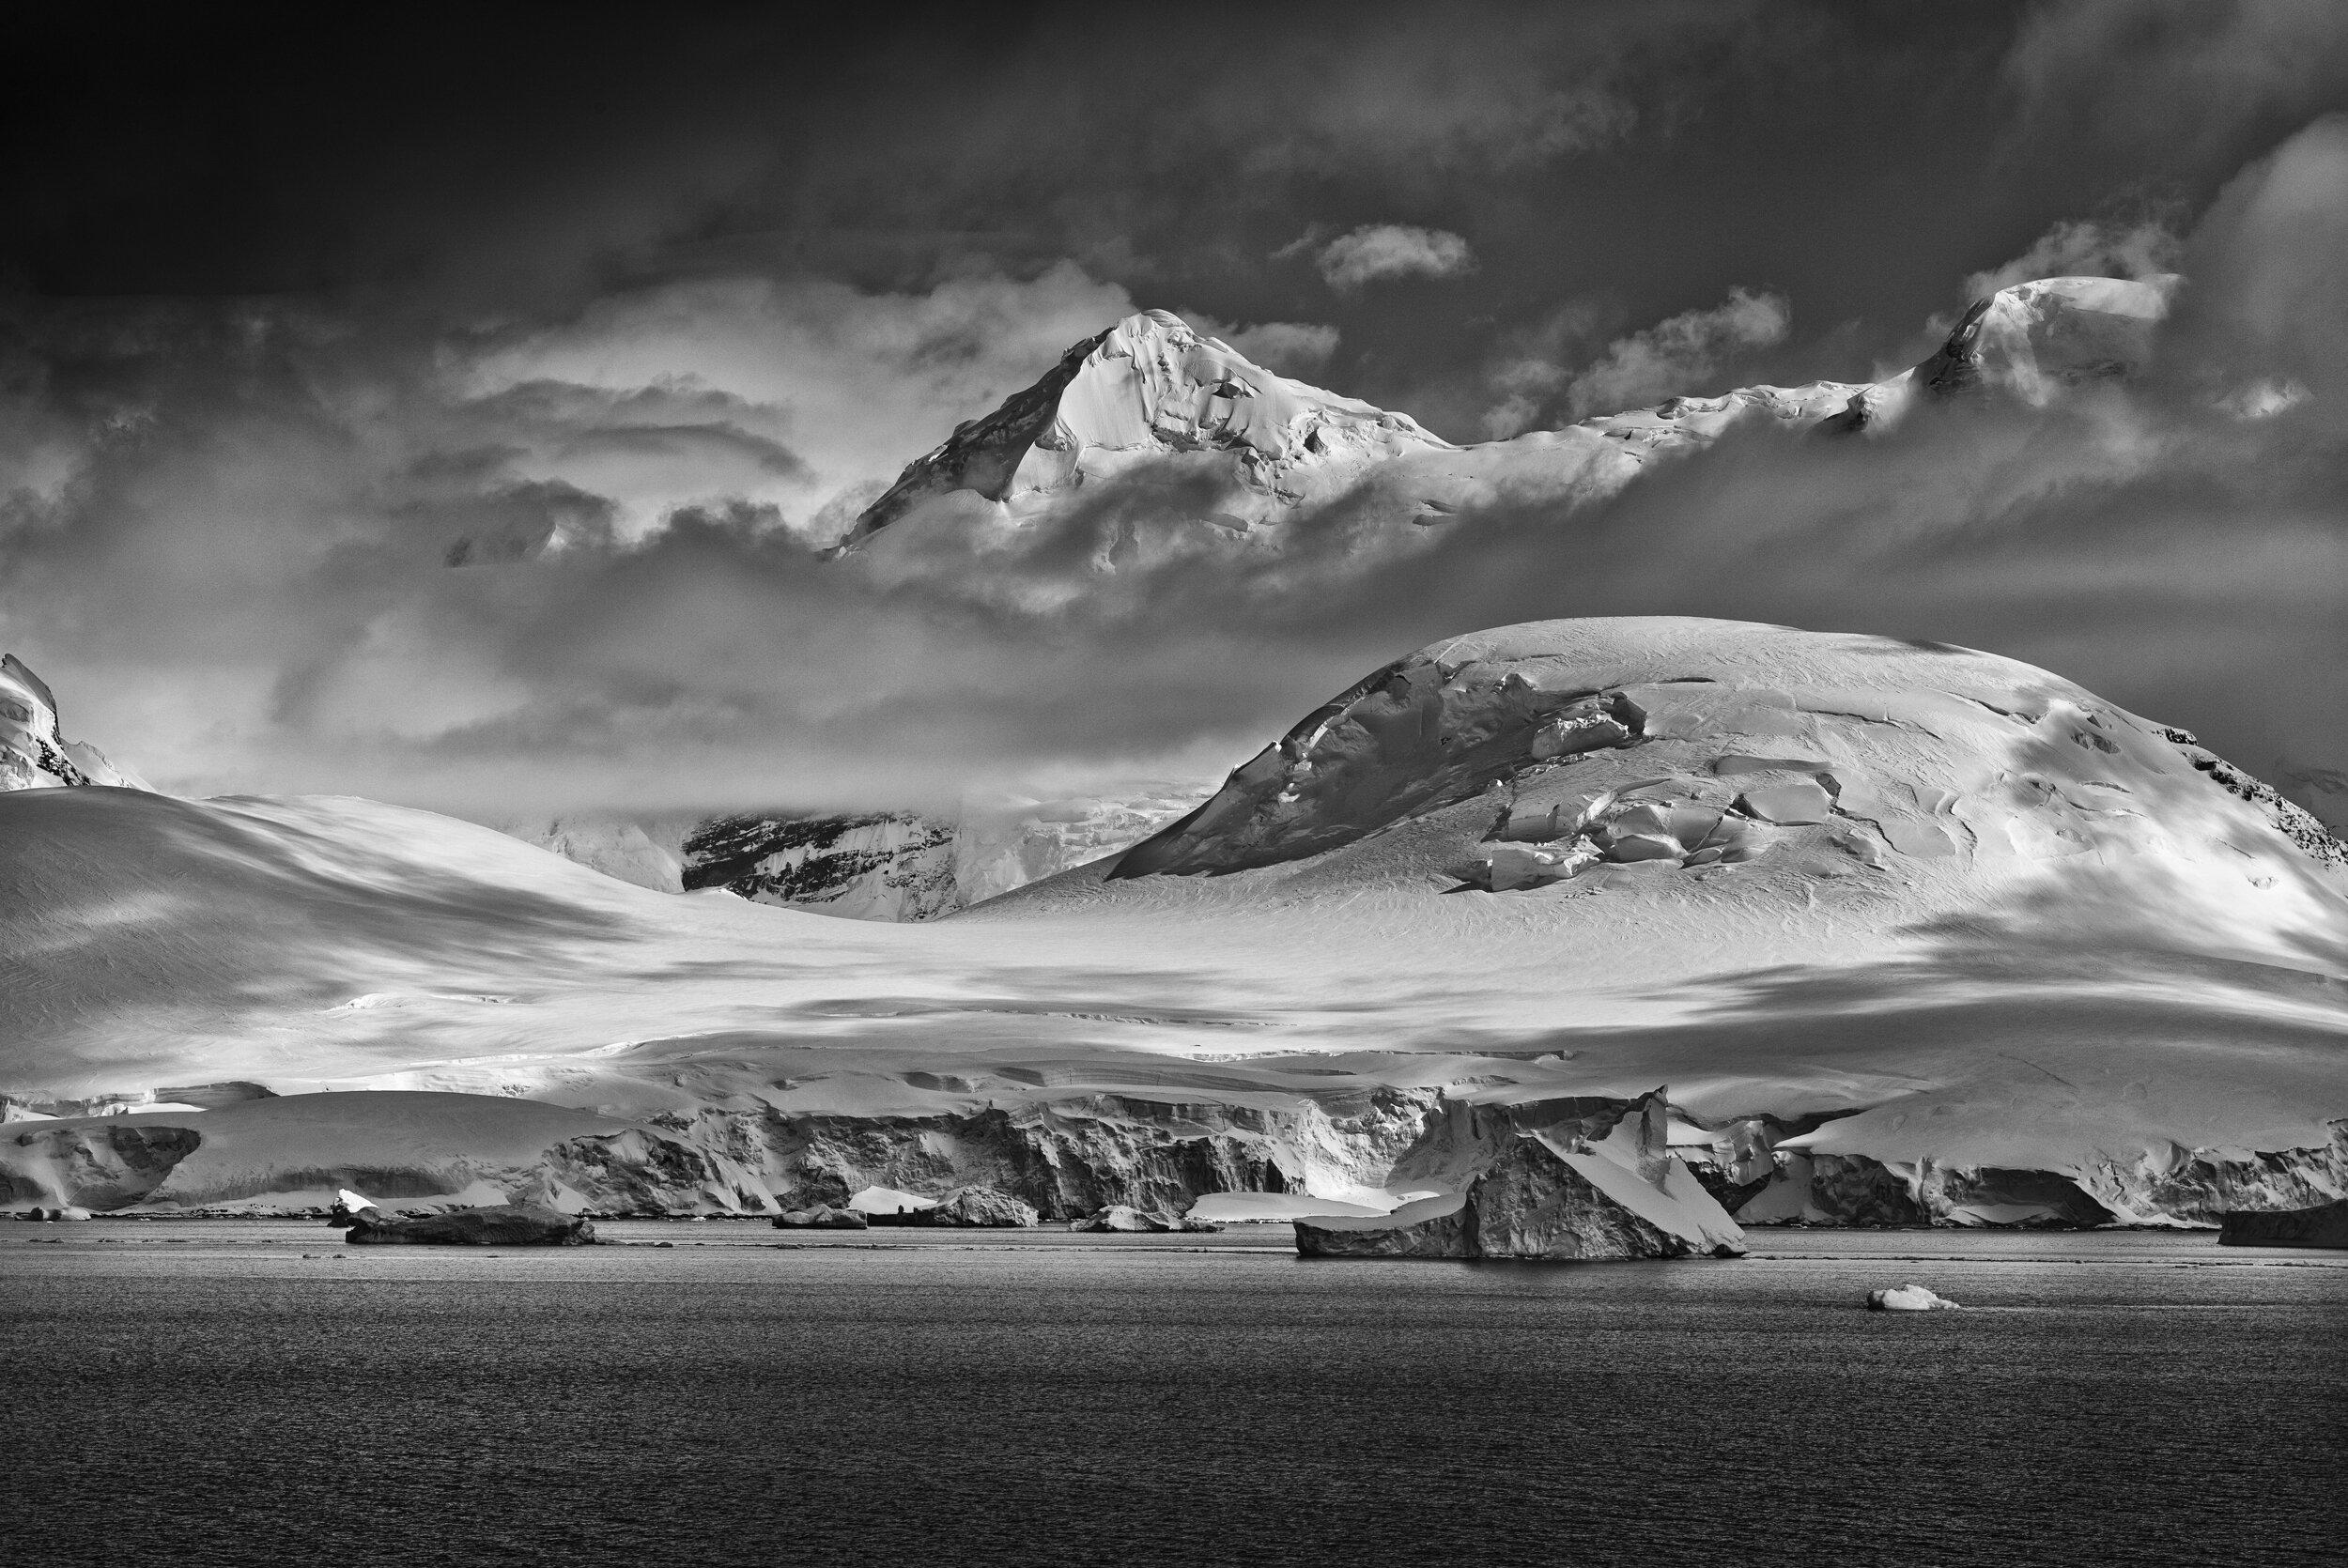 manuel_uebler_antarctica_bw_008.jpg